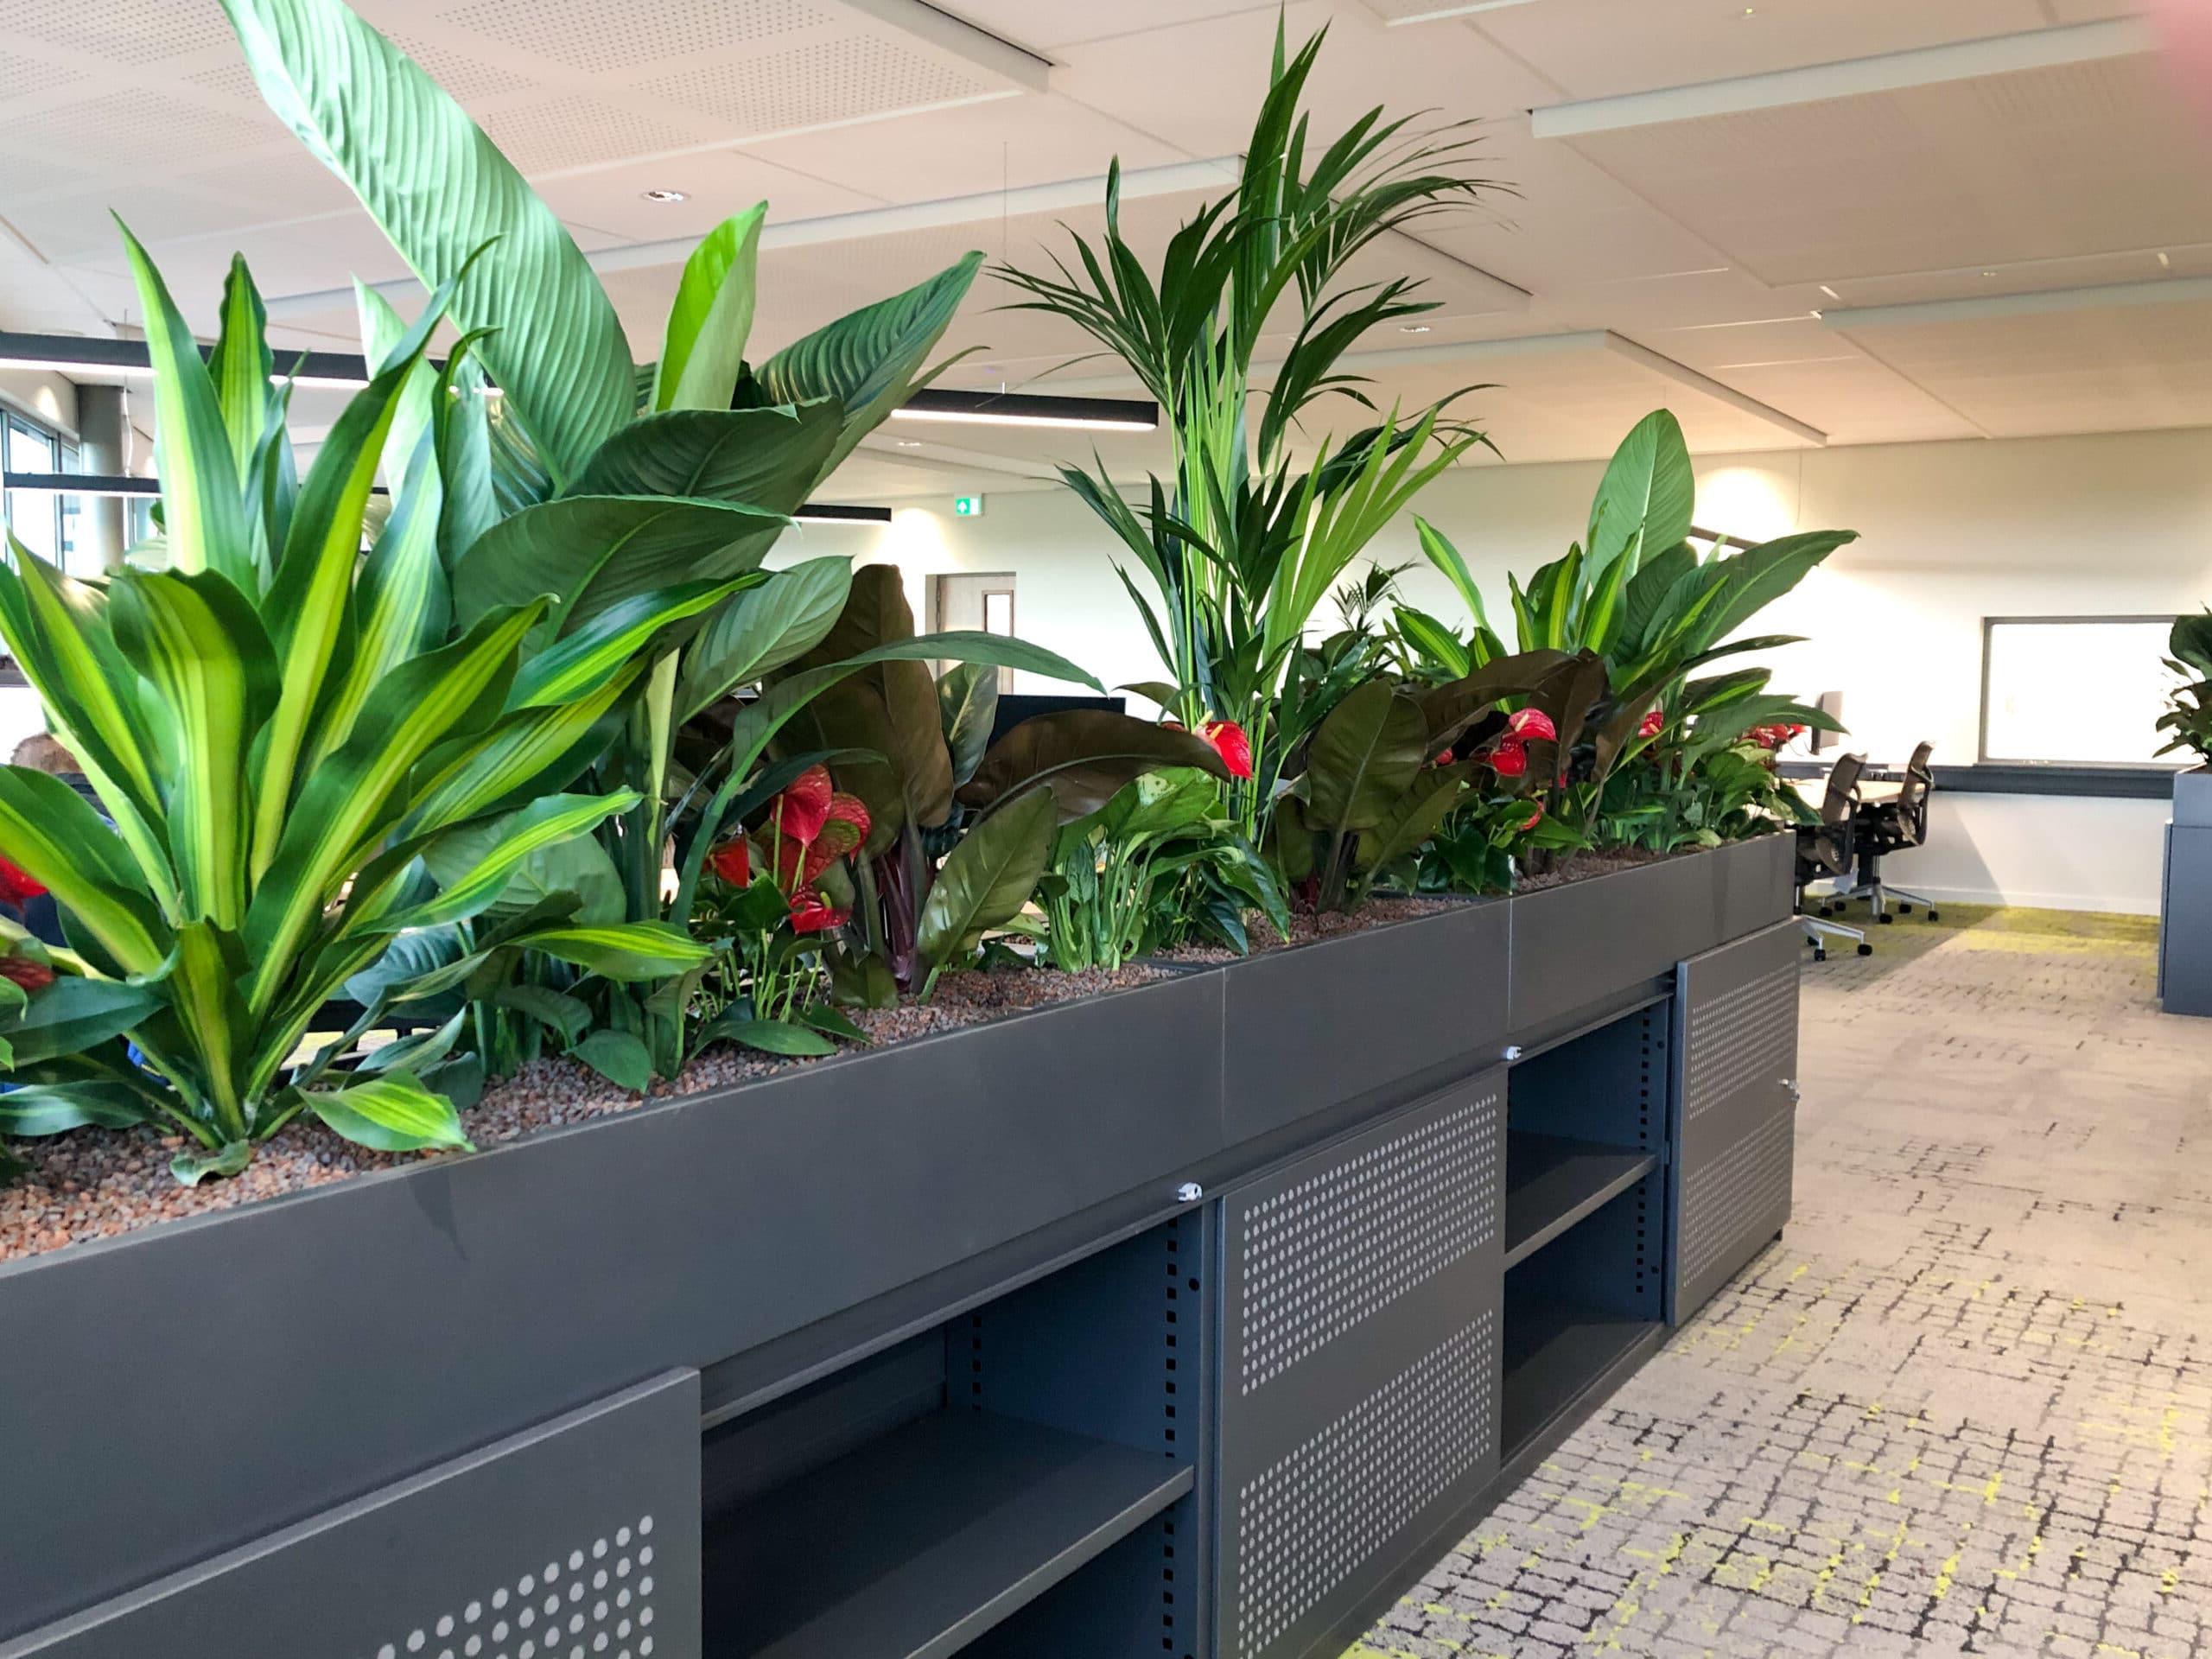 Roomdivider 2021 biophilic design